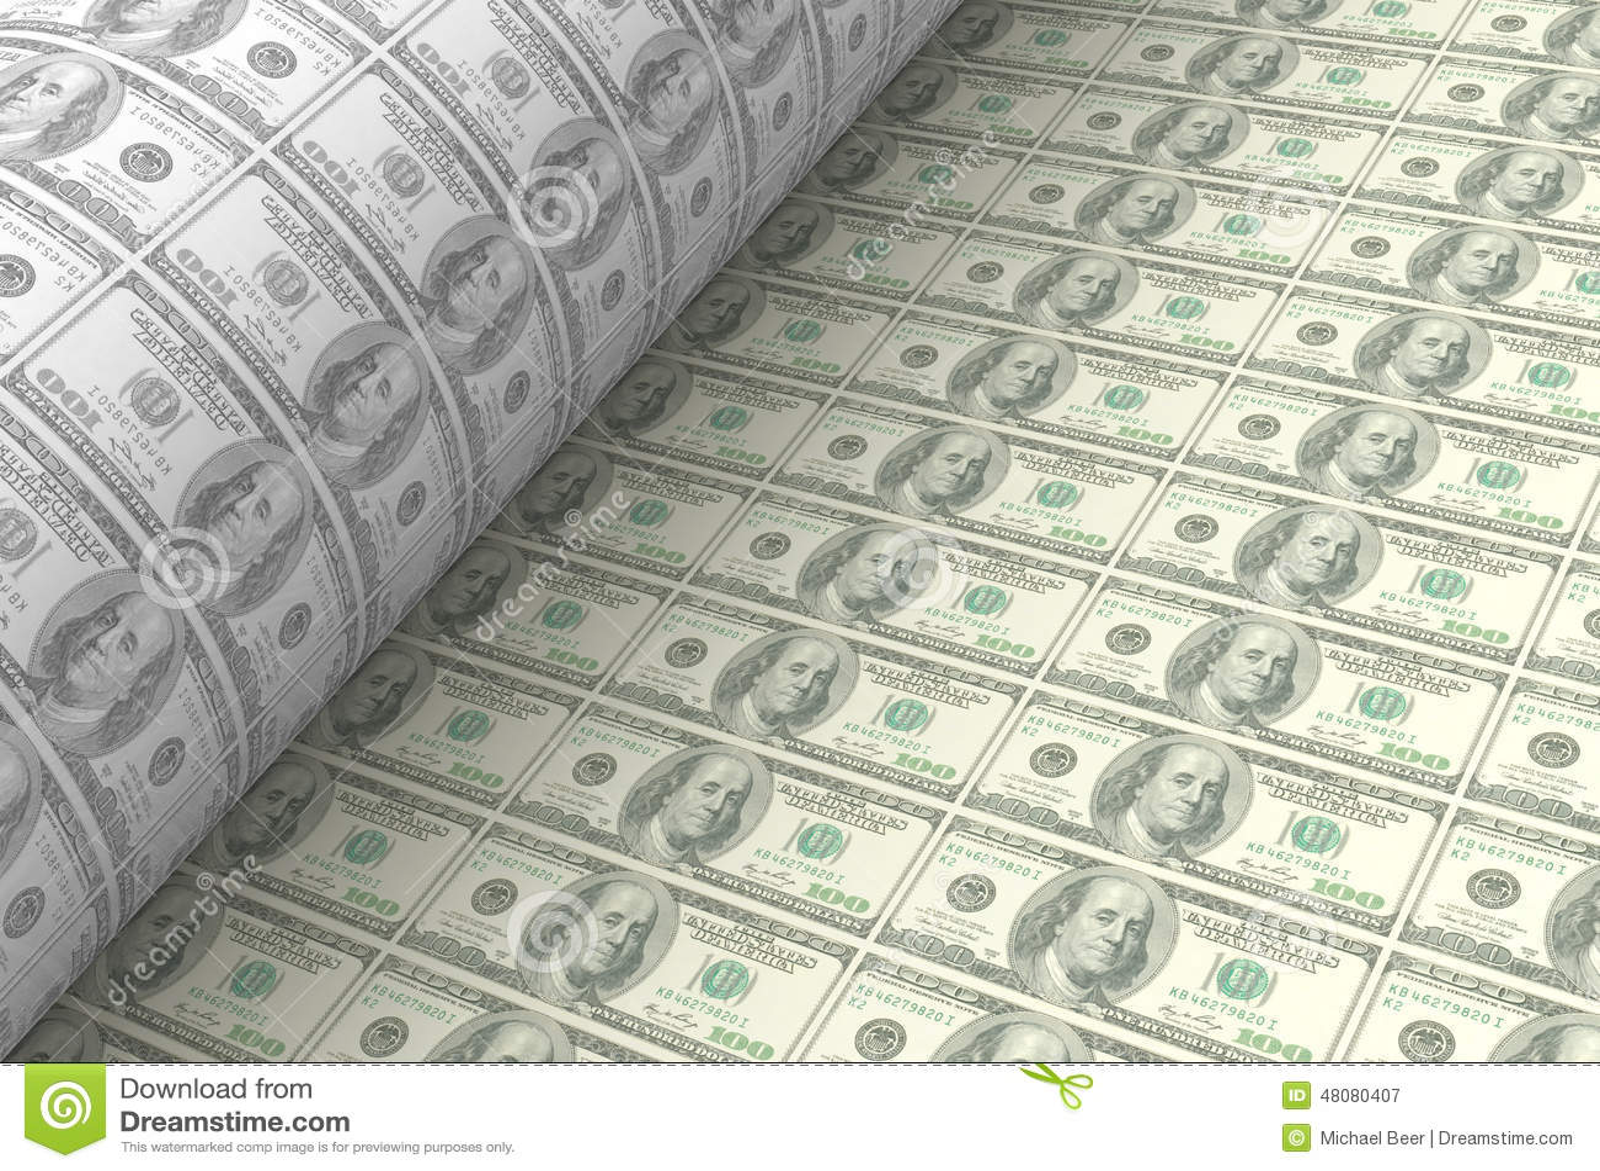 Printing US Dollar Banknotes Stock Illustration - Illustration of